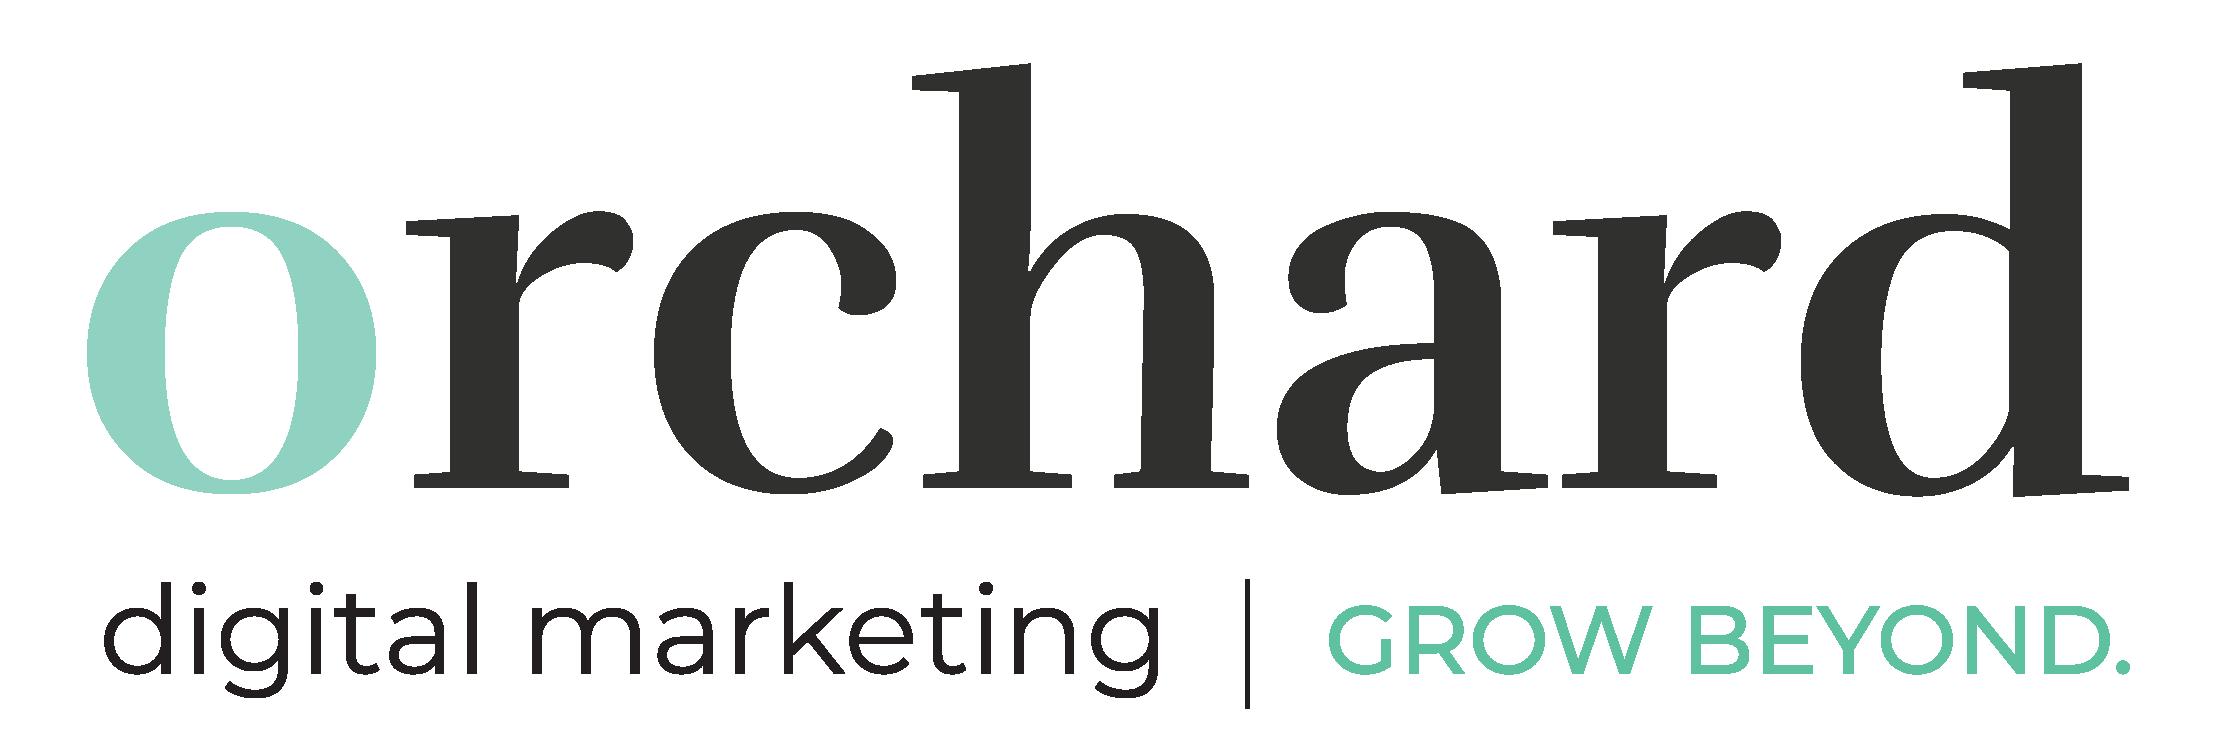 Orchard Digital Marketing